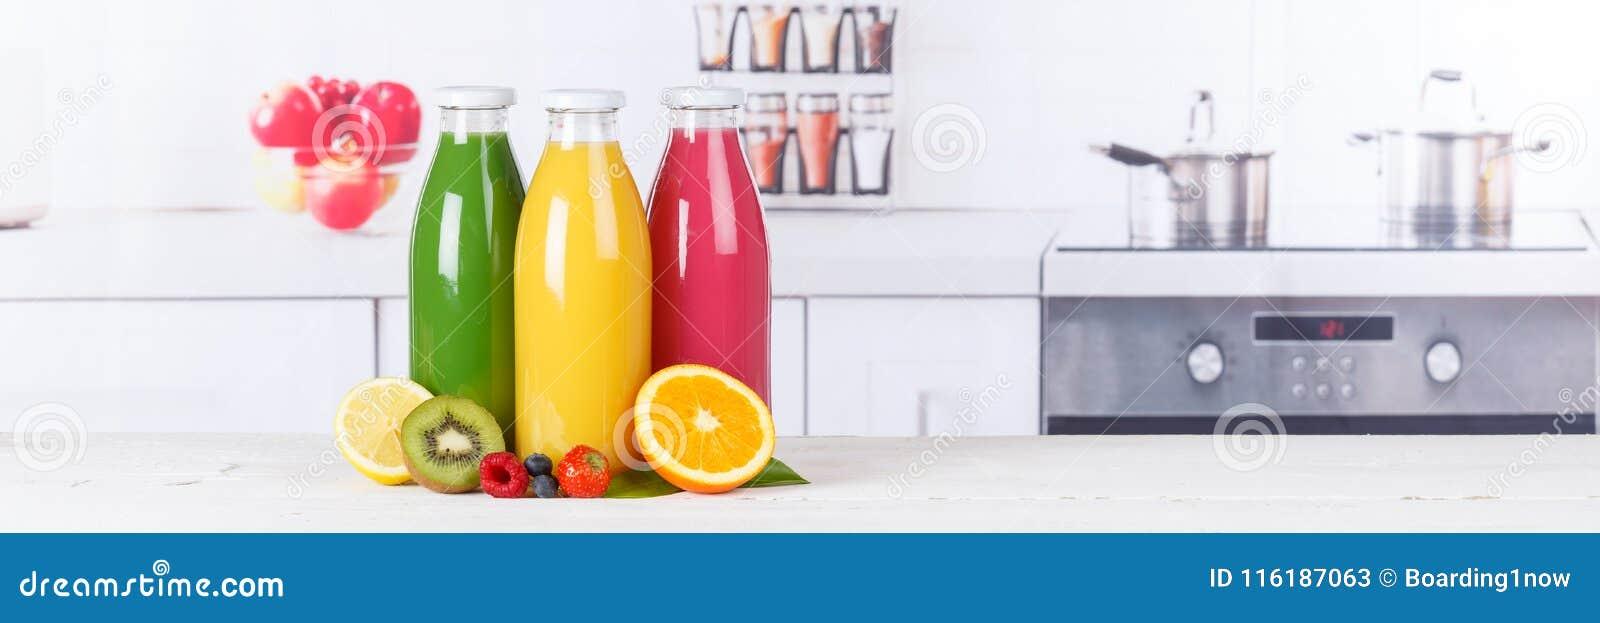 Juice smoothie orange smoothies in kitchen copyspace banner bottle fruit fruits